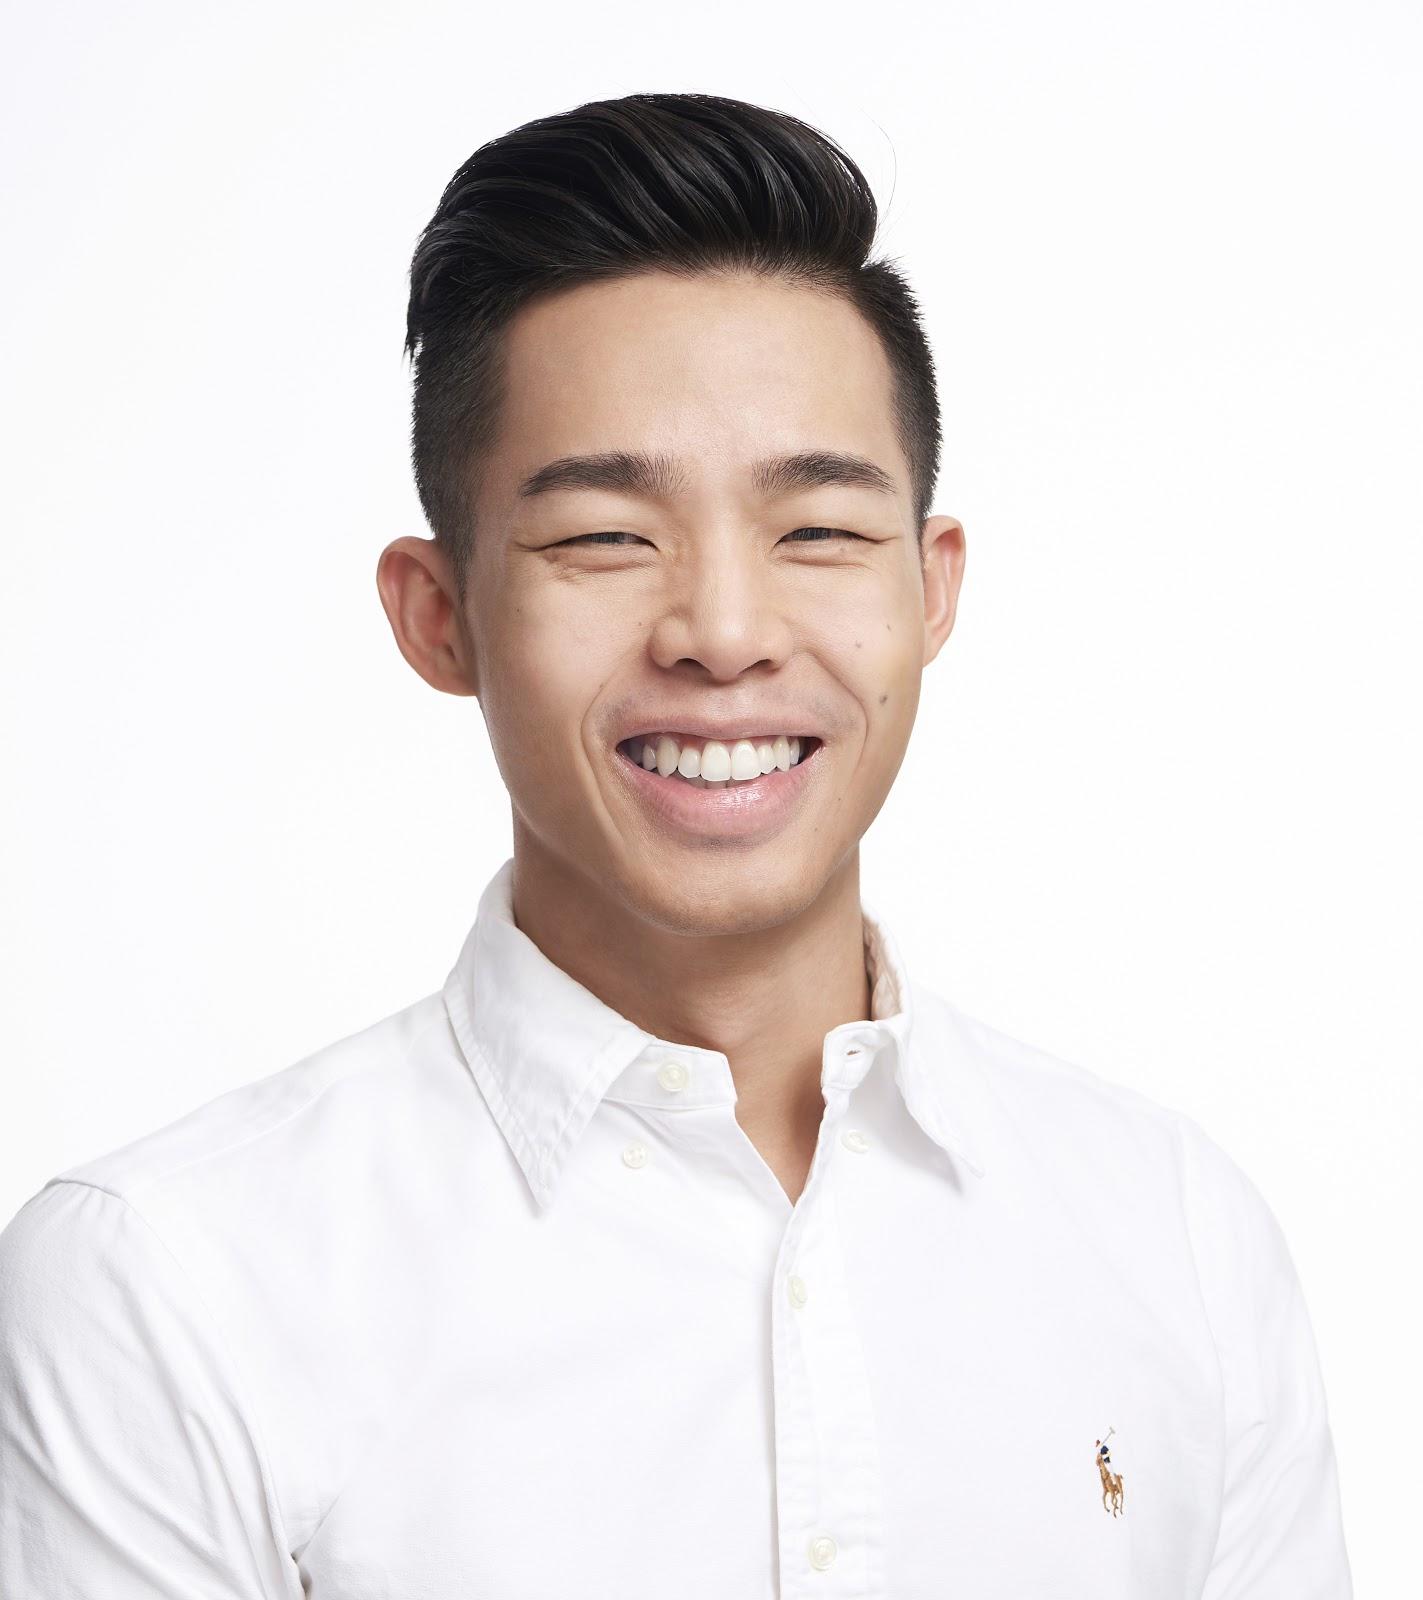 Eugene Cheng pic